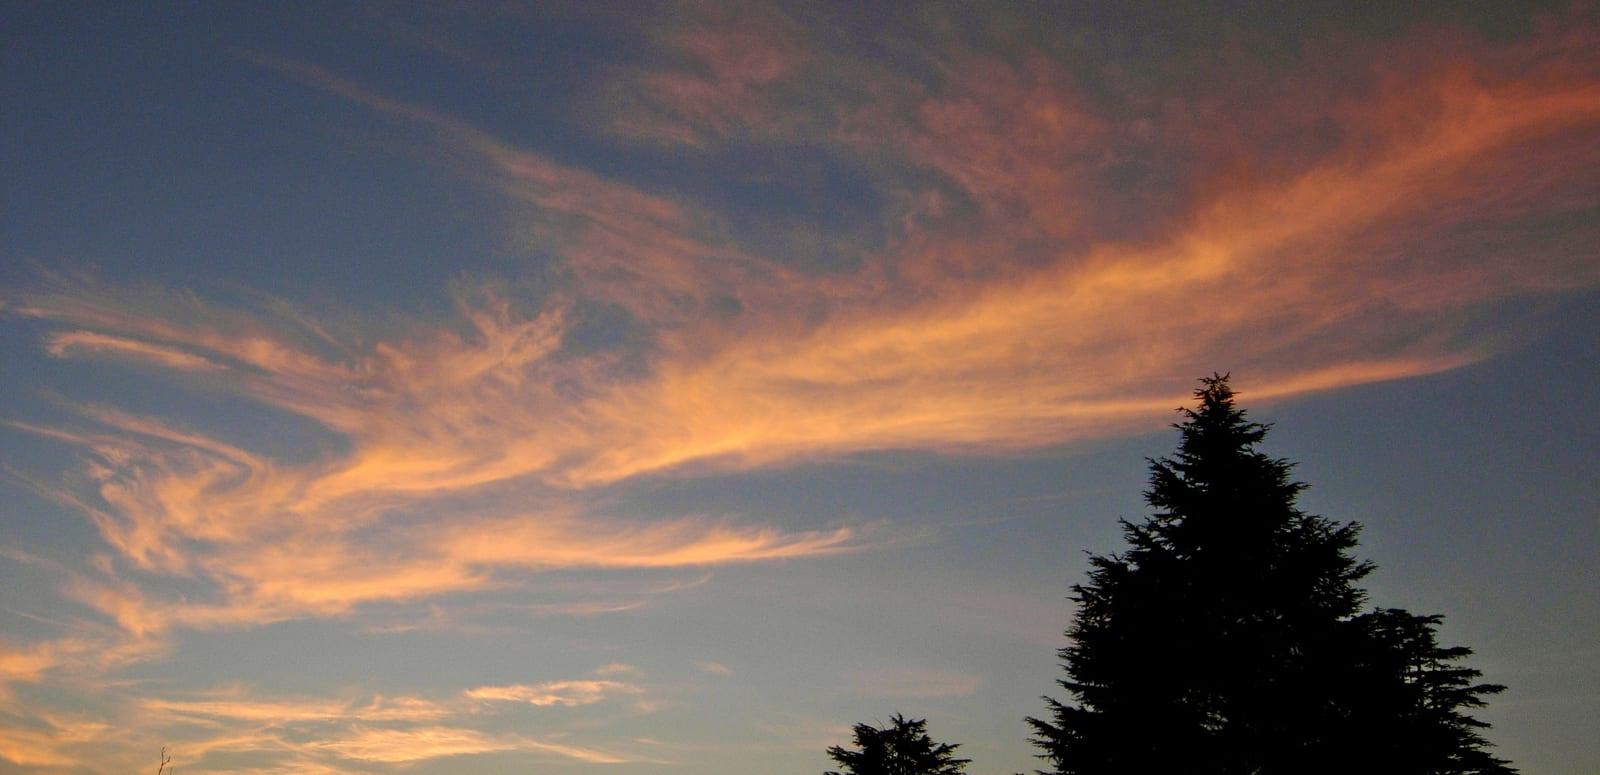 1492768560_sunset_at_kausani.jpg